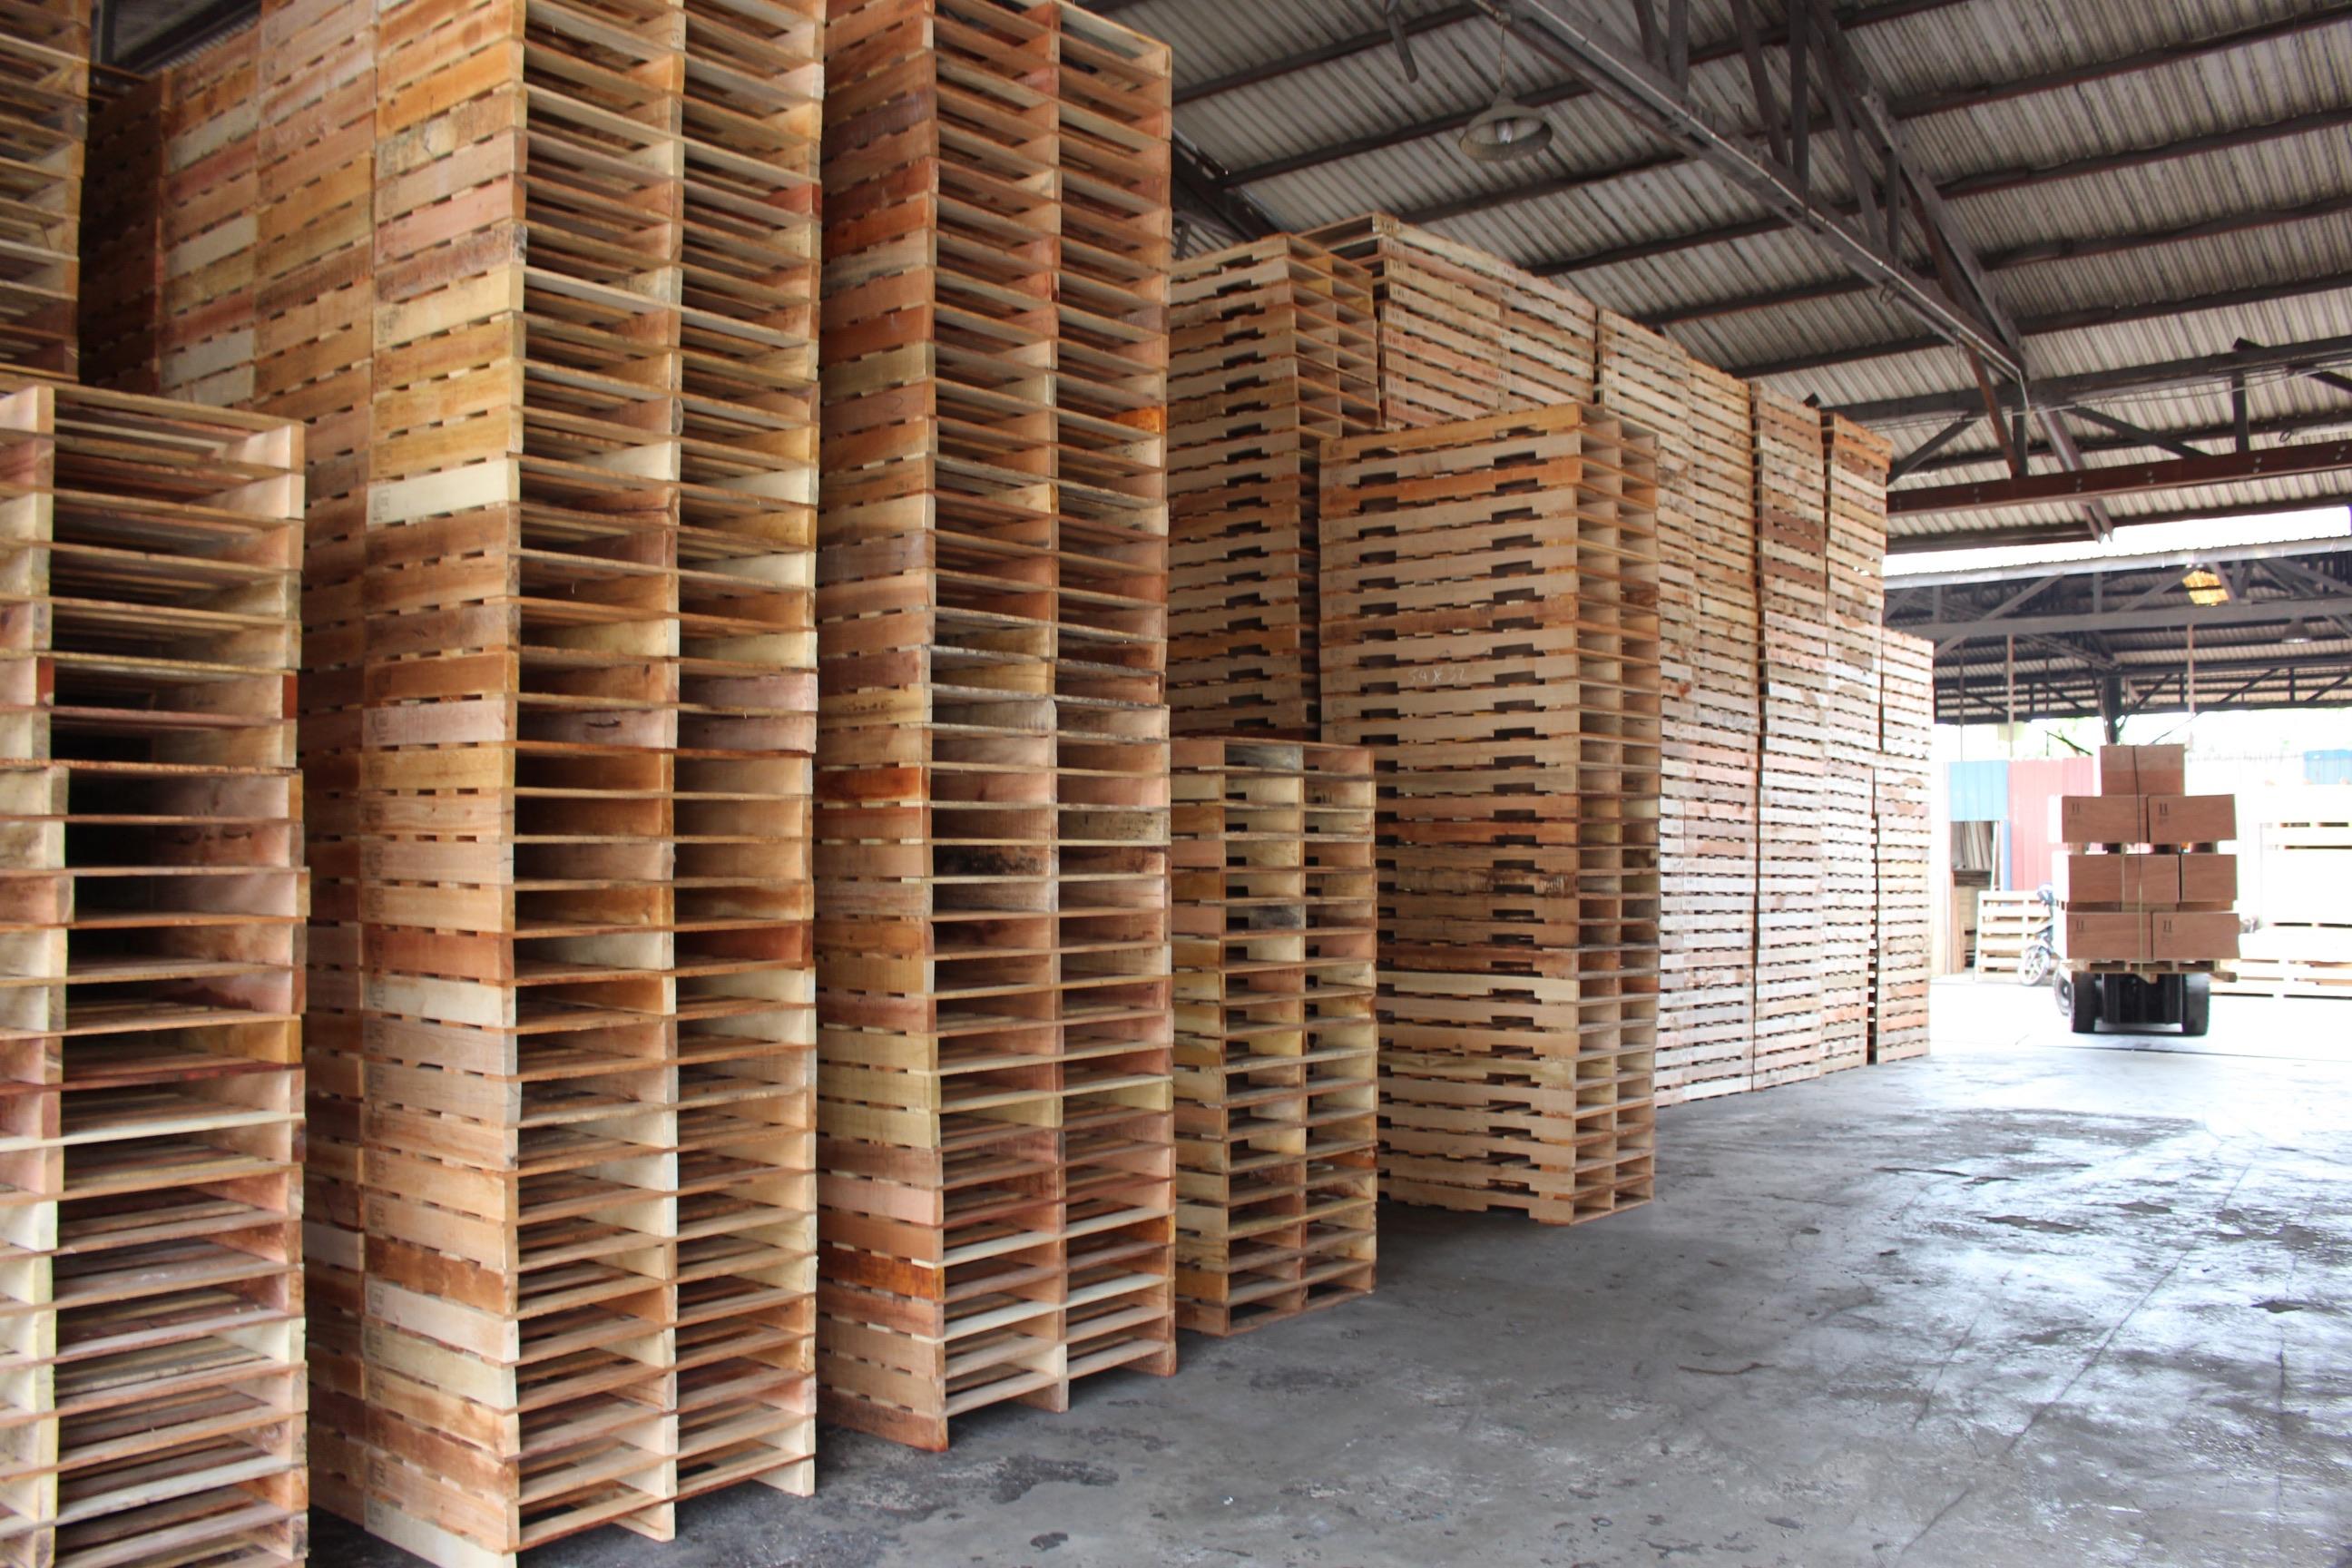 New Wooden Pallets – XCEL Industrial Supplies